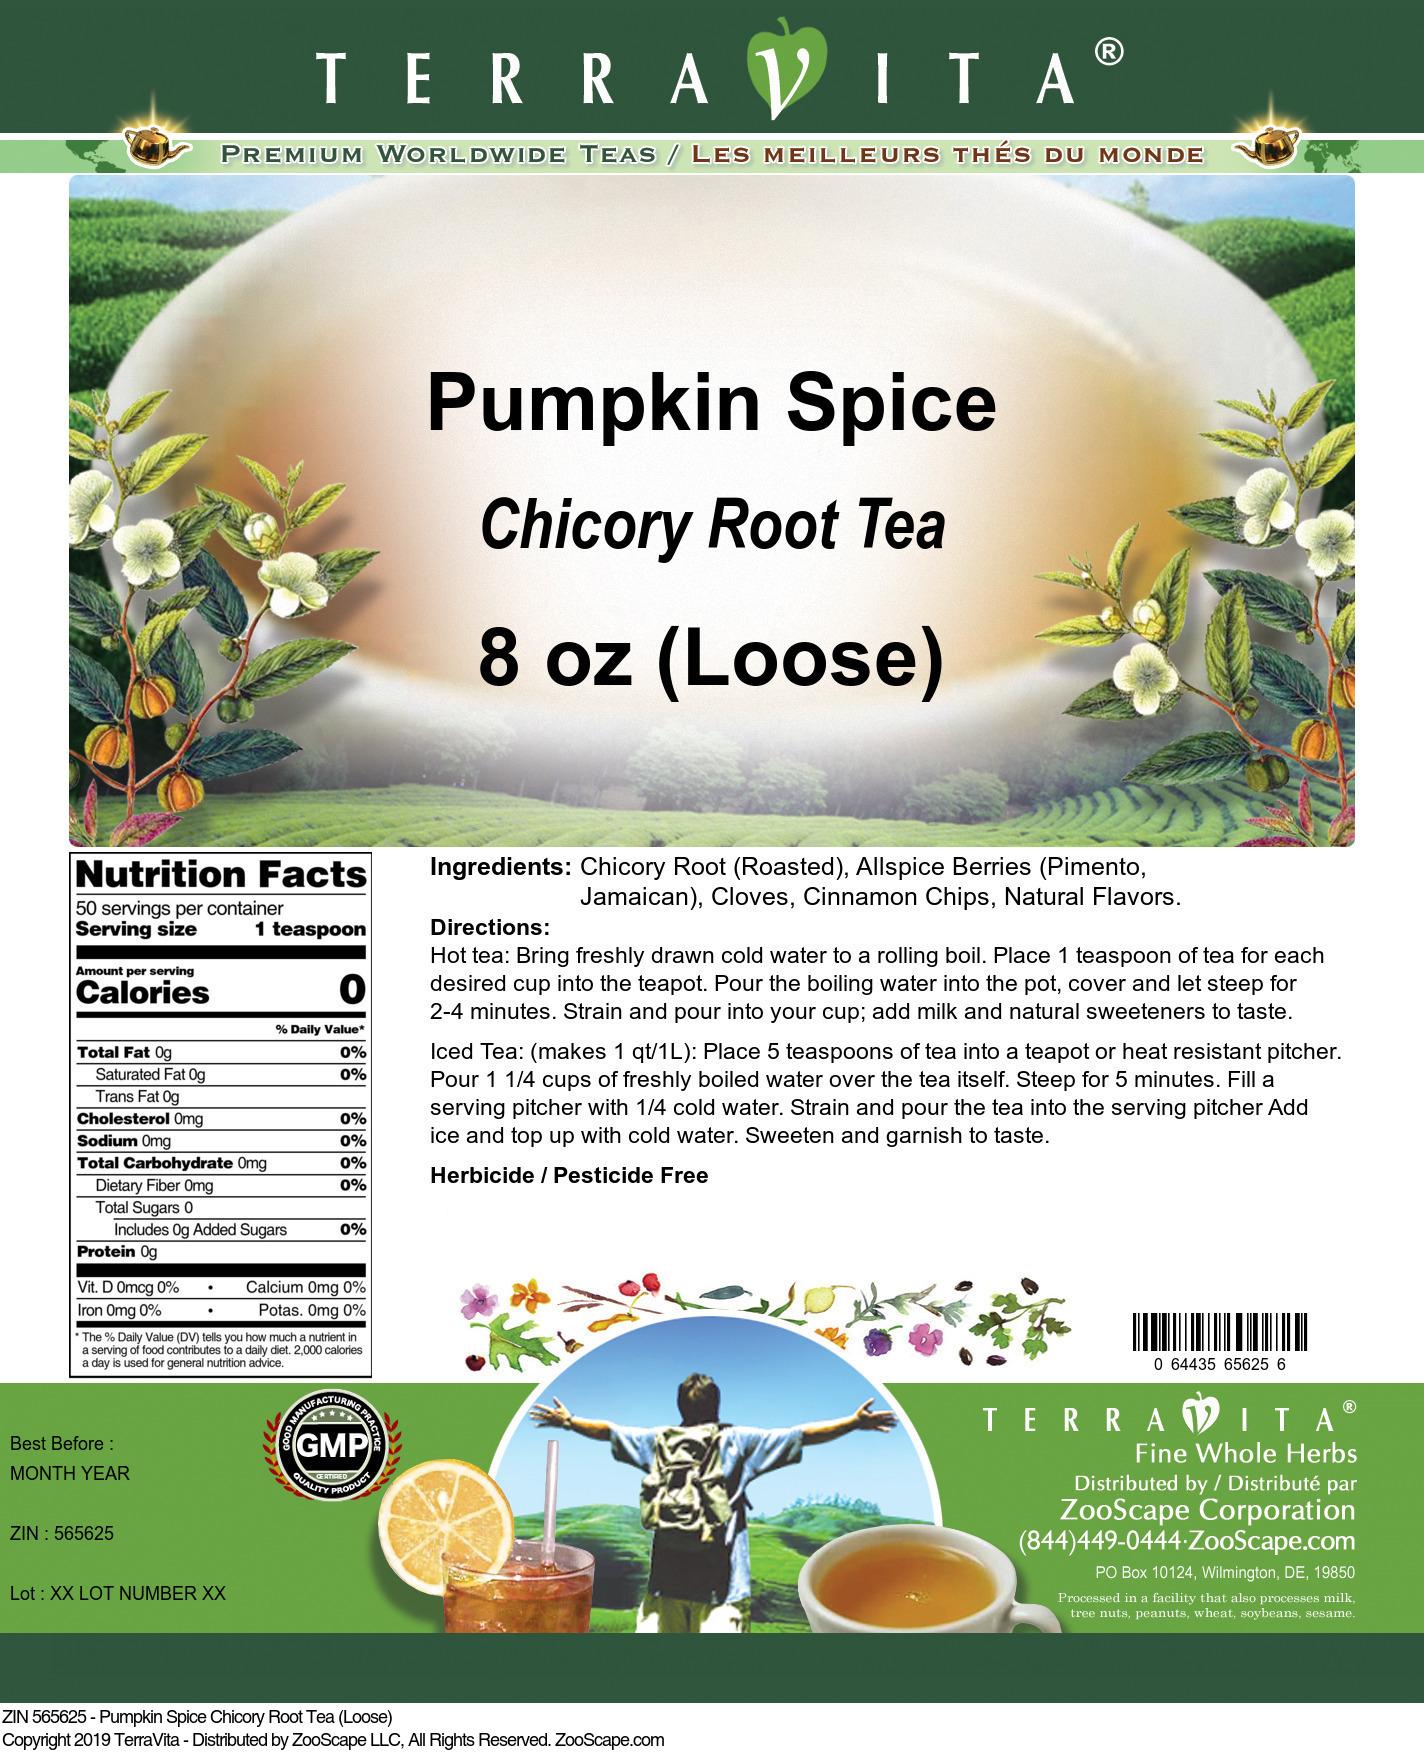 Pumpkin Spice Chicory Root Tea (Loose)